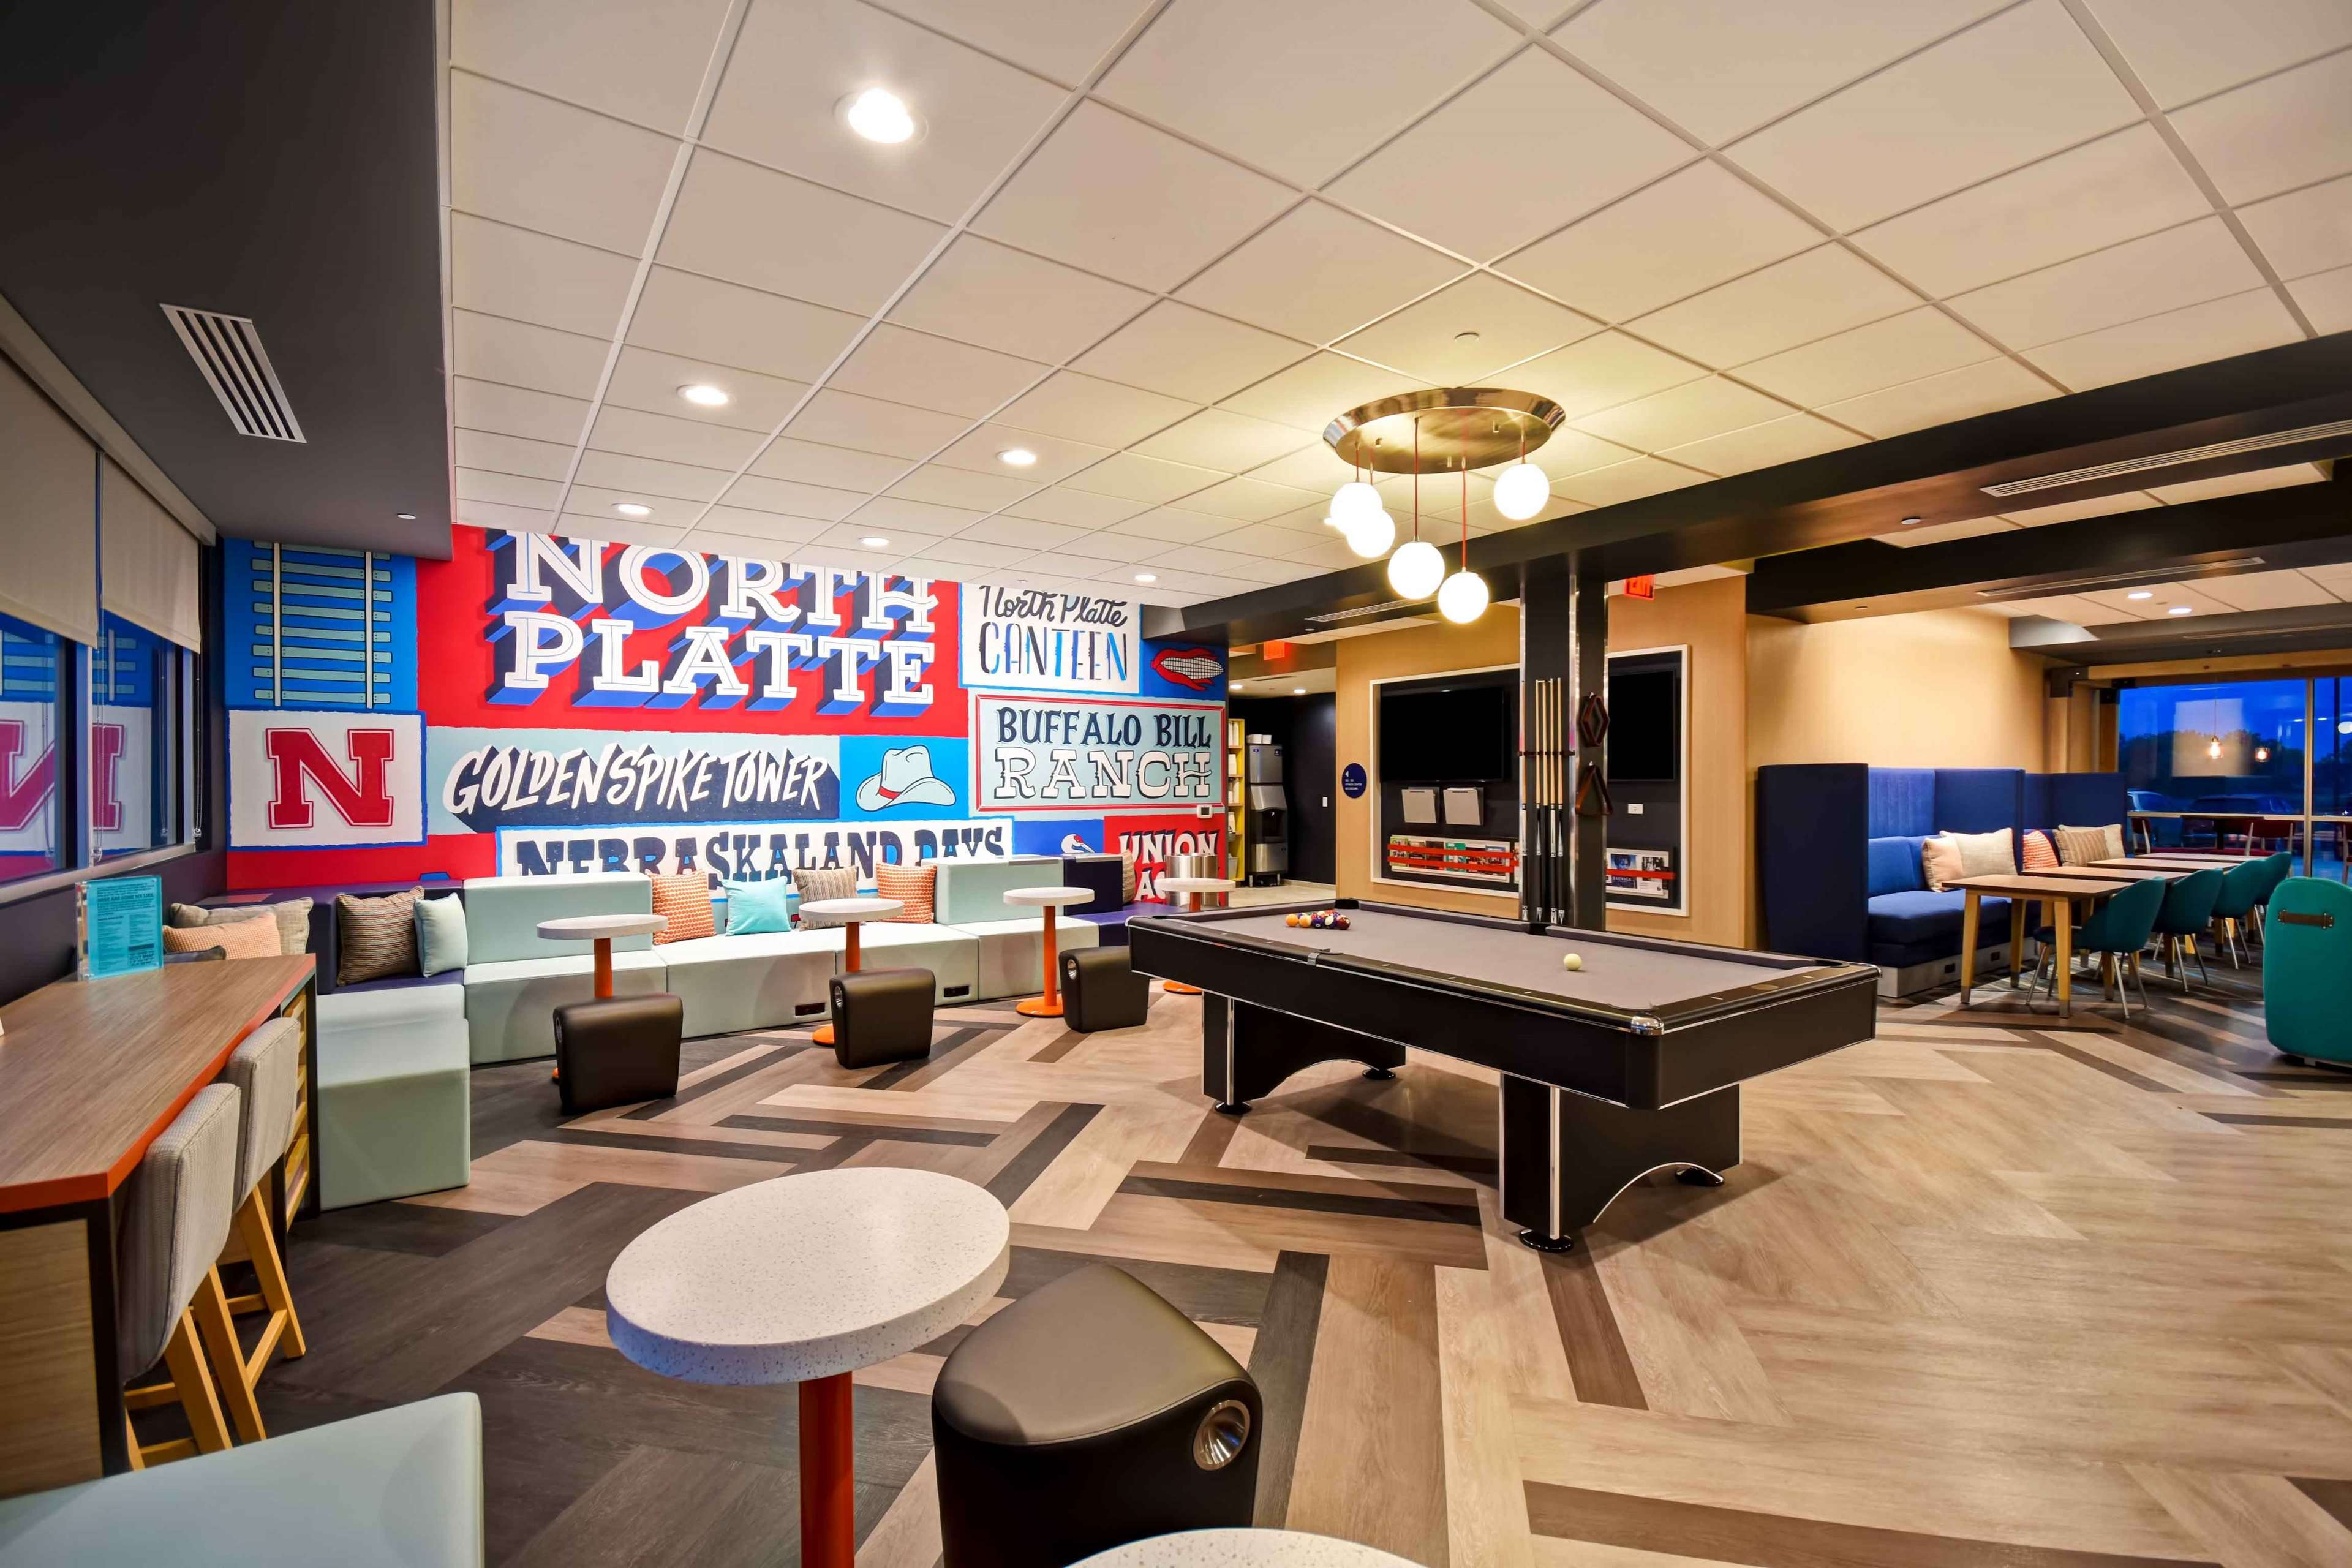 Tru by Hilton North Platte image 4